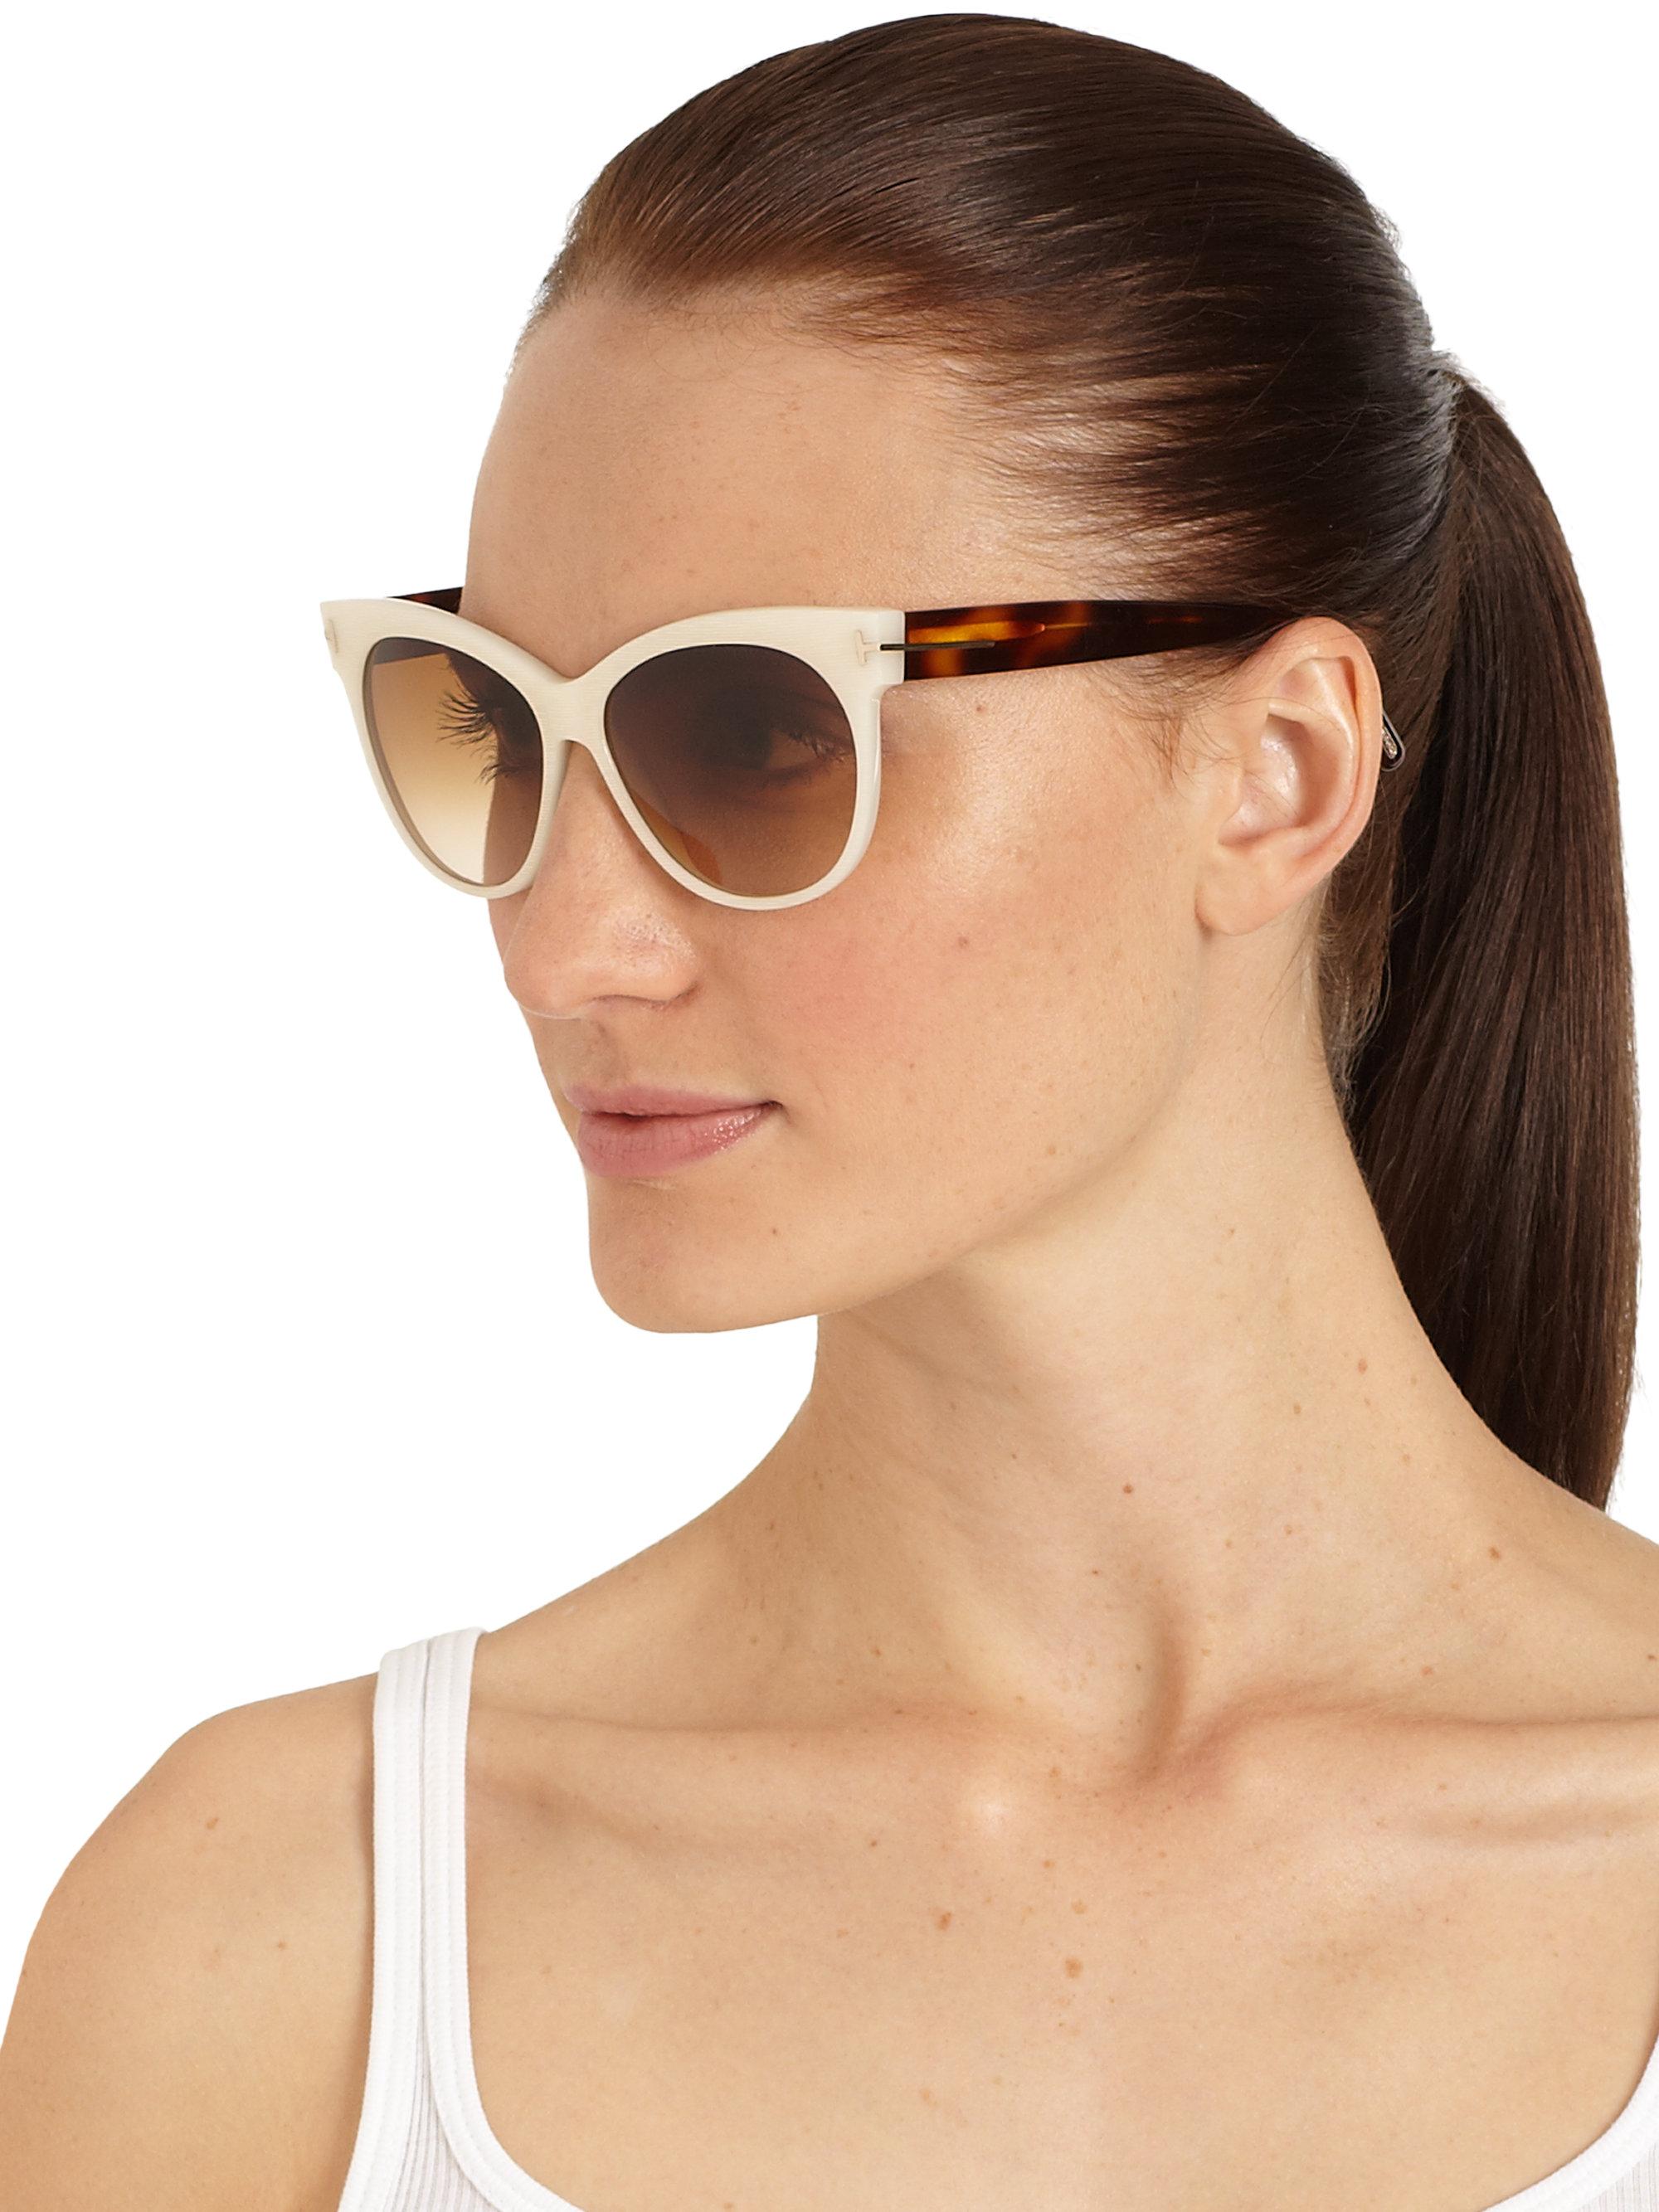 s tom sunglasses brown i women ford cody glasses smoke aviator purple womens violet